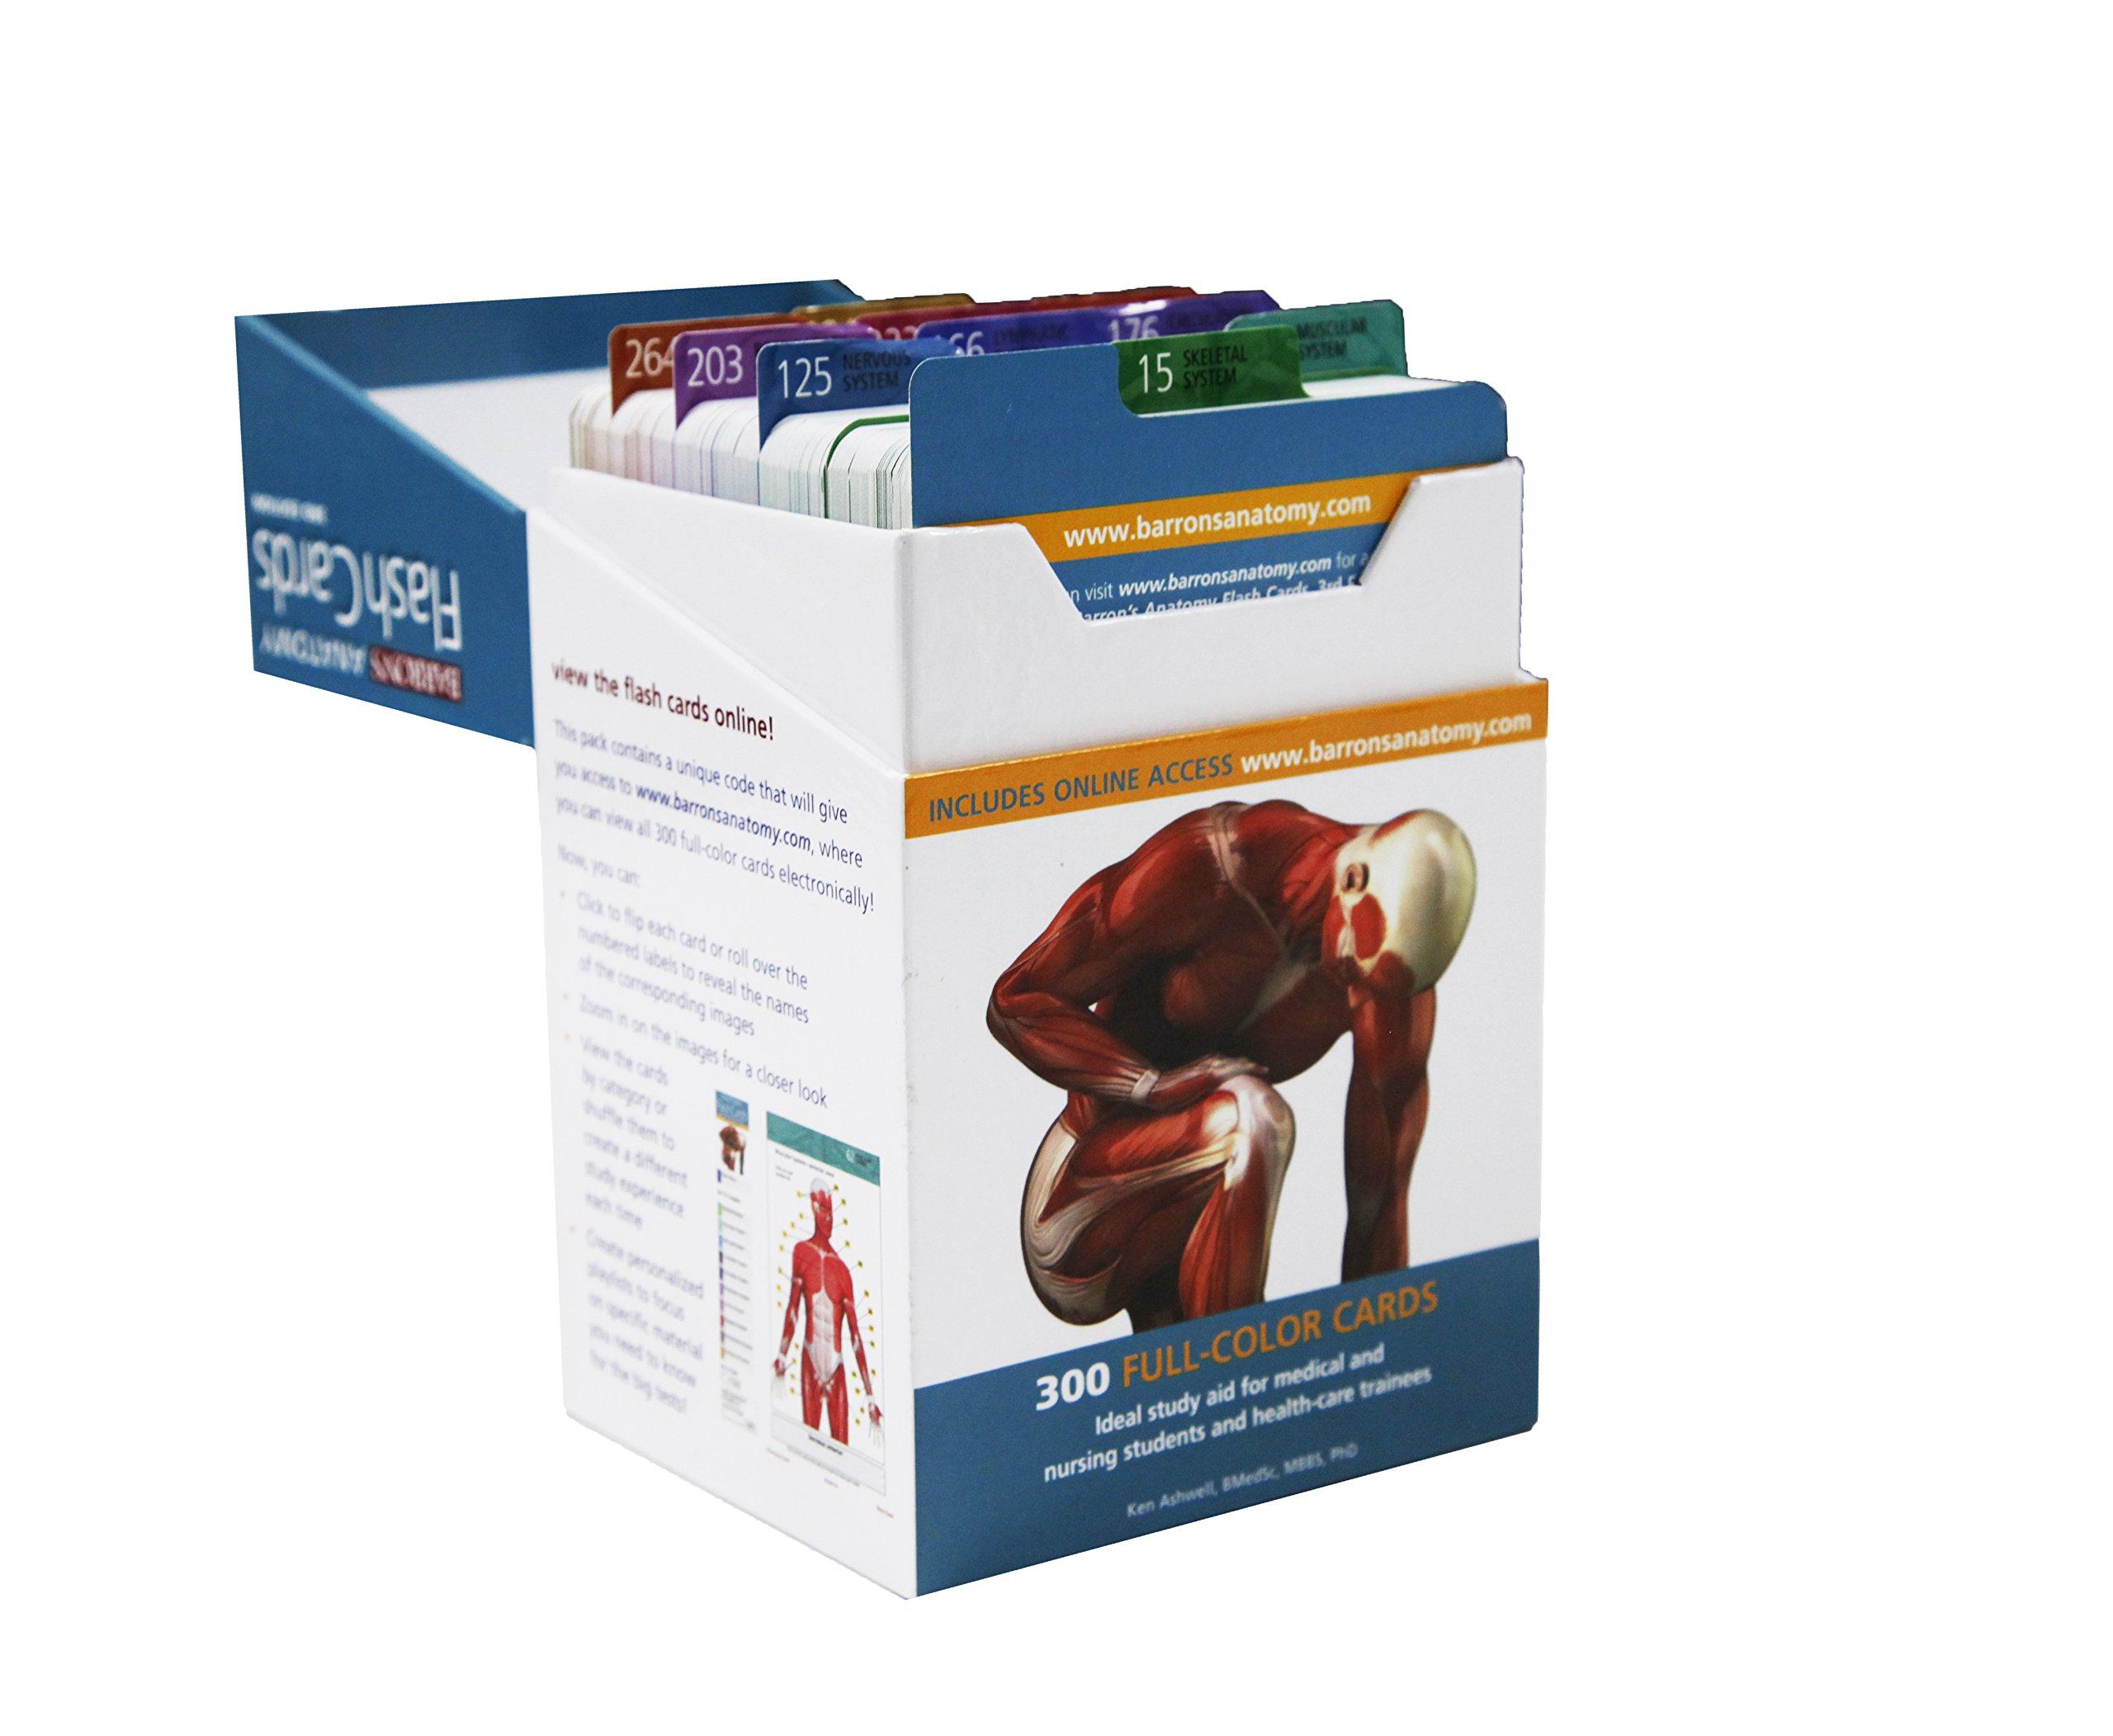 Barron\'s Anatomy Flash Cards: Ken Ashwell: 9781438077178: Anatomy ...